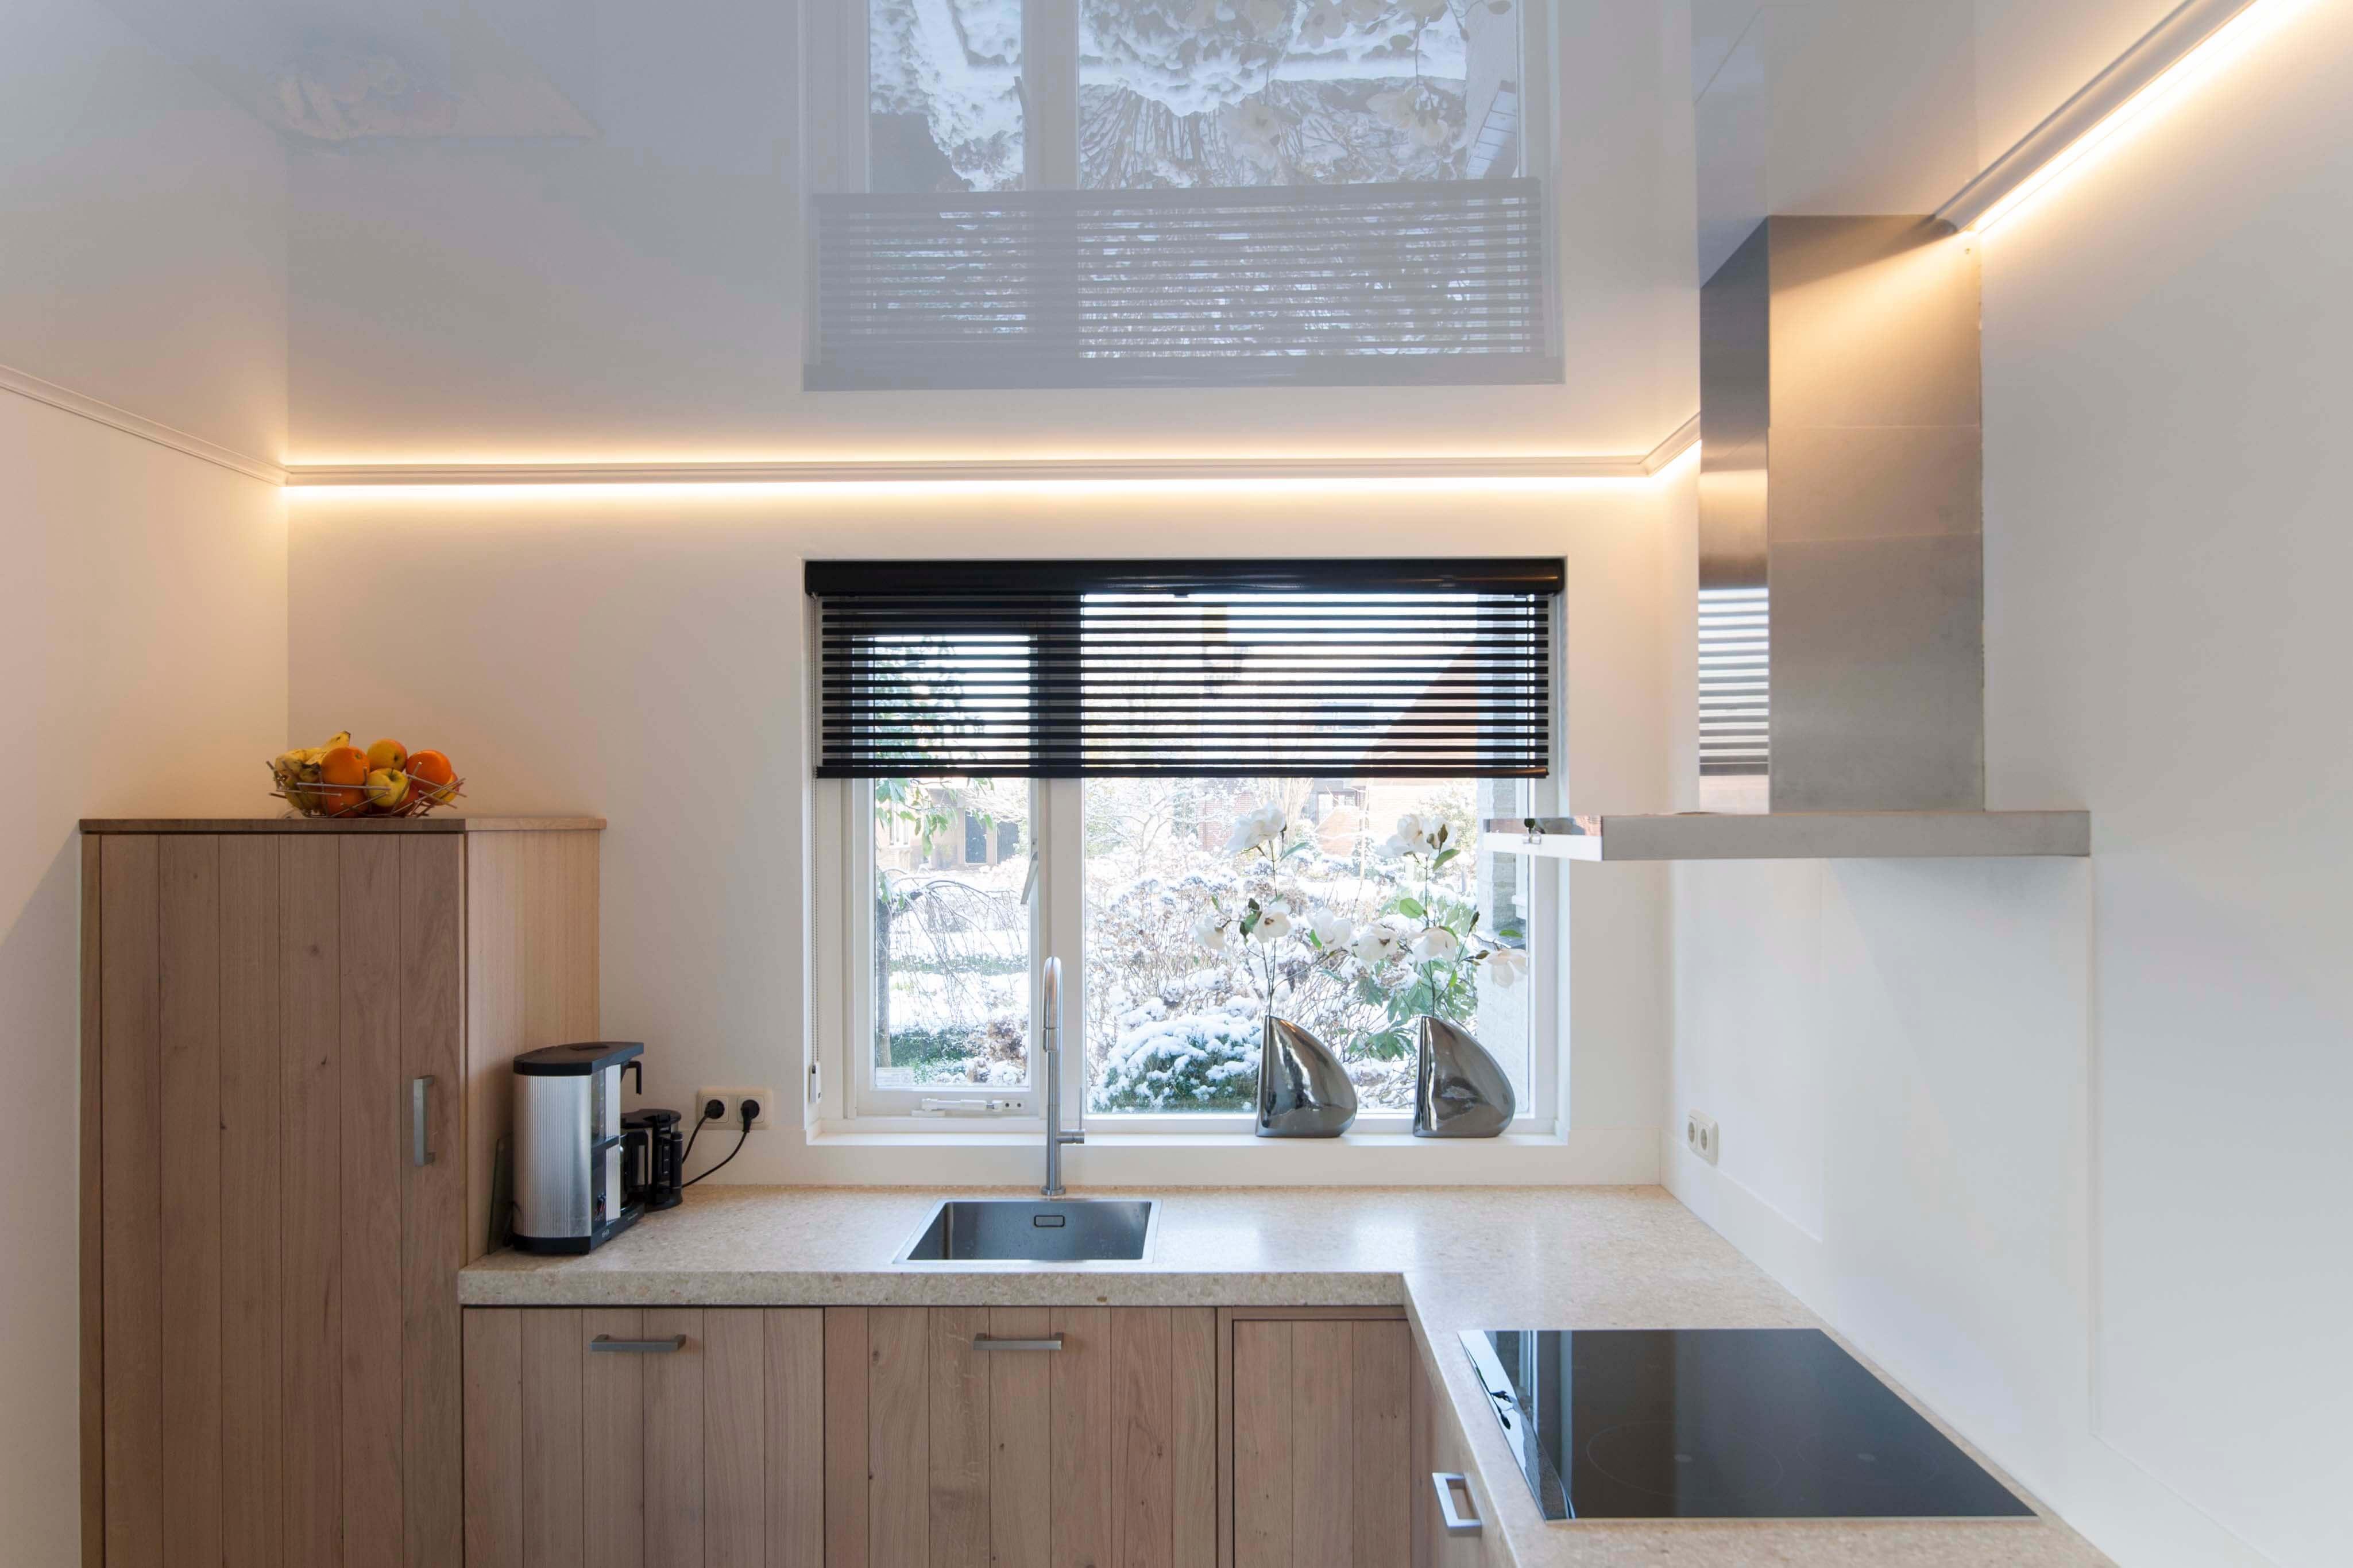 Keukenverlichting plafond drie verlichtingtypes in de keuken led verlichting keuken plafond - Design keuken plafond ...